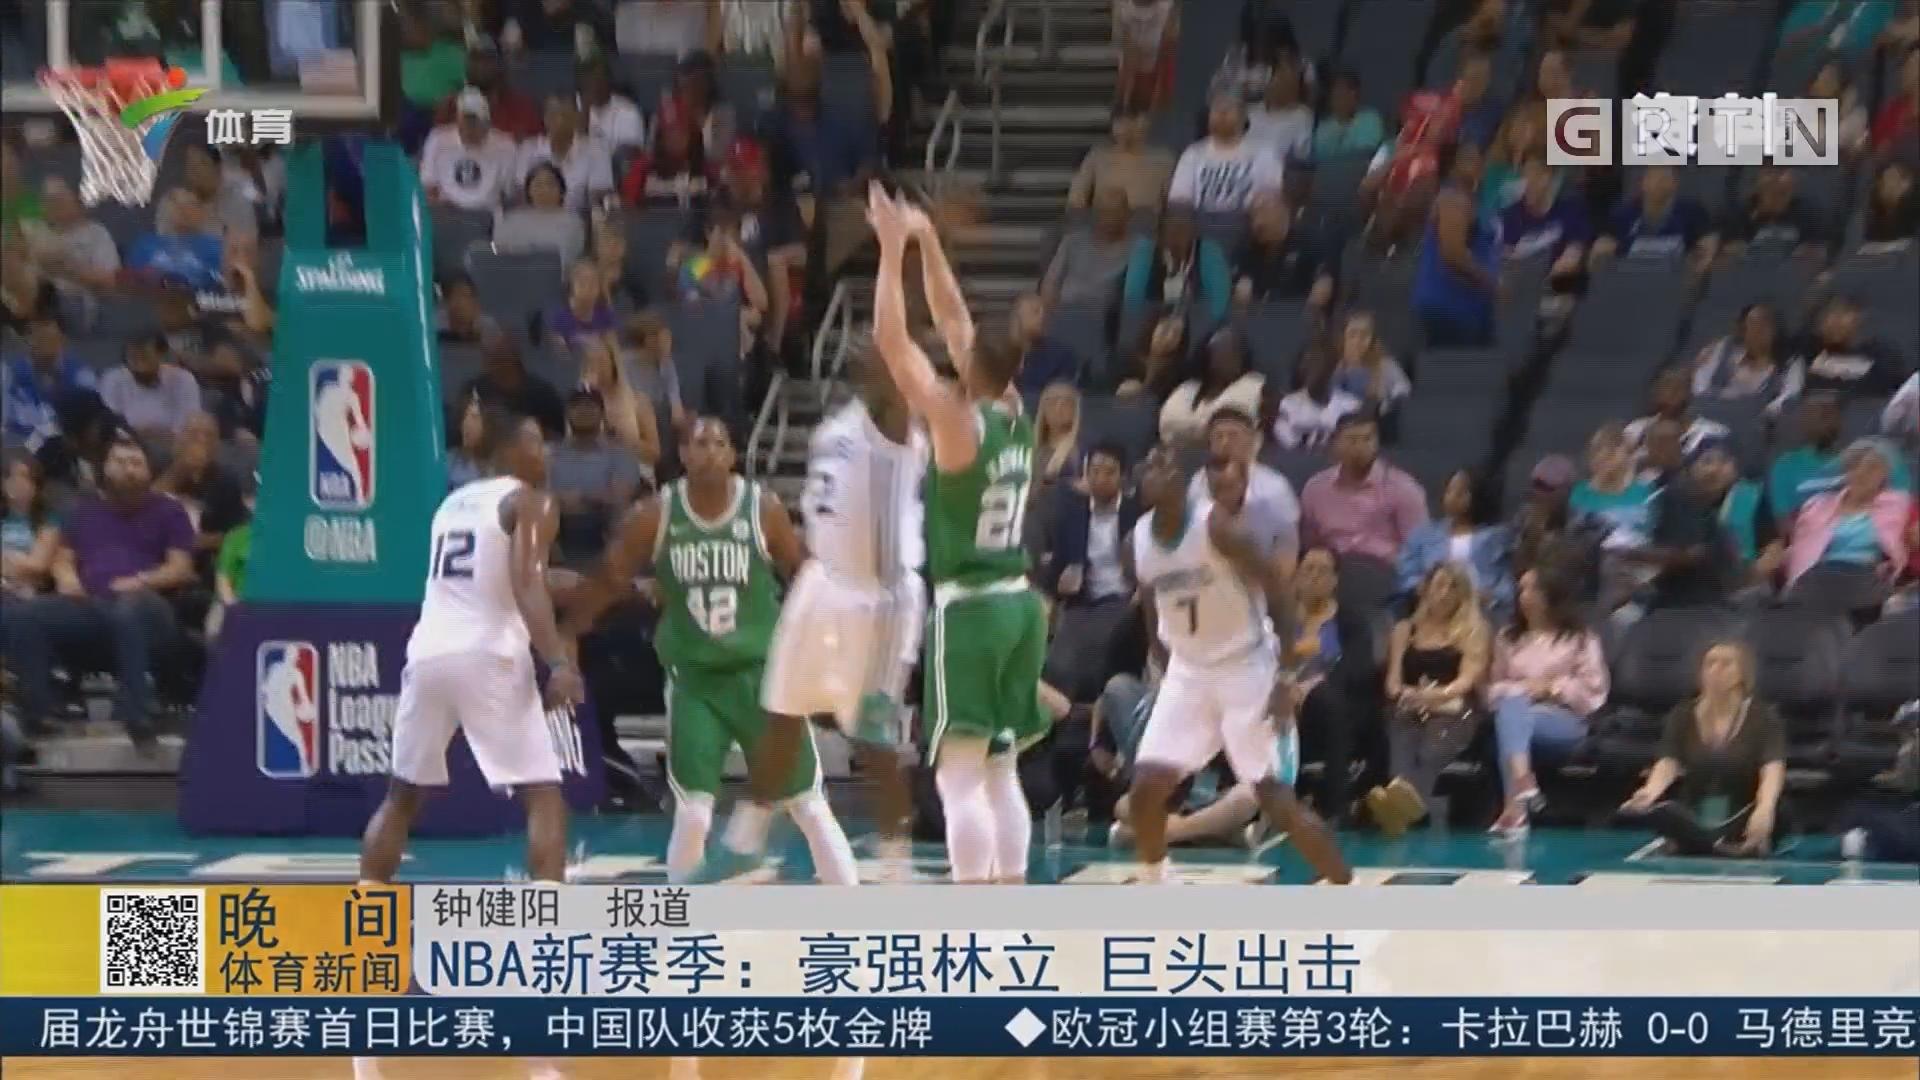 NBA新赛季:豪强林立 巨头出击